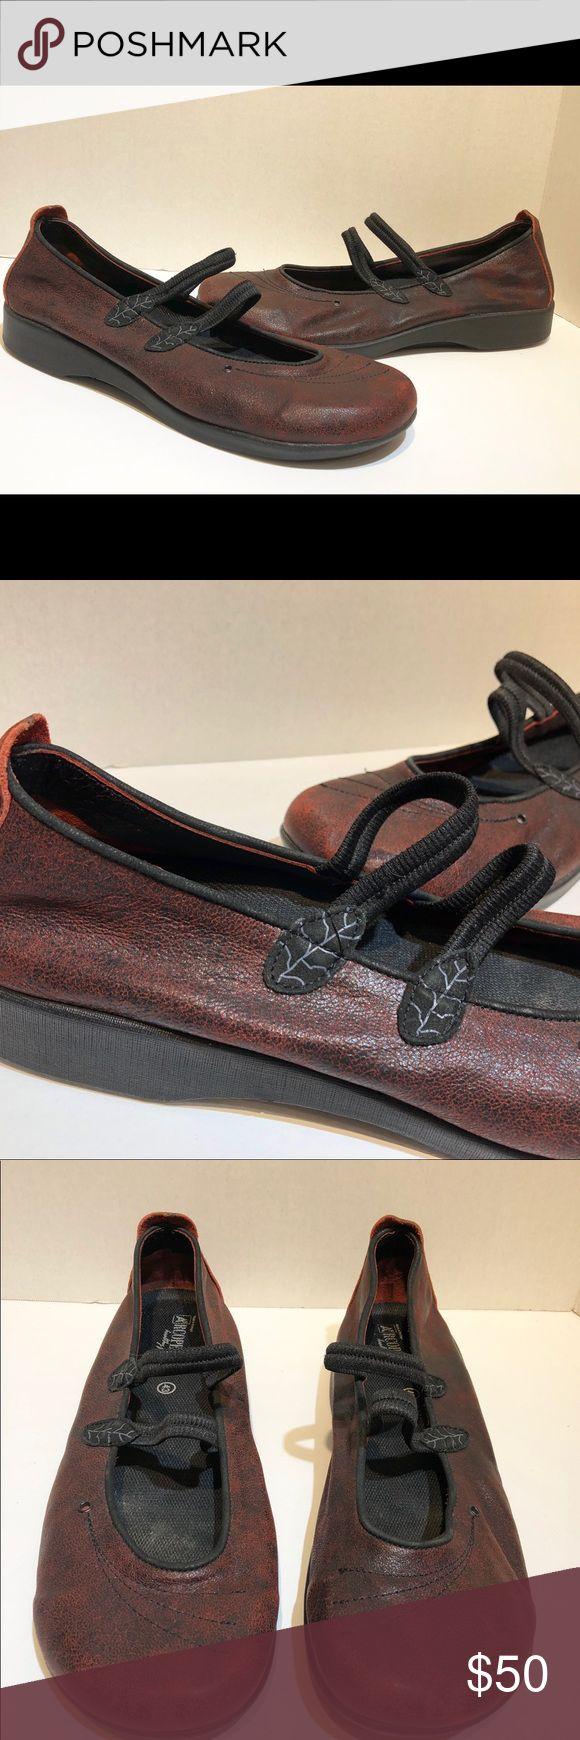 arcopedico Womens Burgundy Mary Janes Size 12 arcopedico Womens Burgundy Mary Janes Size 43 US Size 12 EUC arcopedico Shoes Flats & Loafers